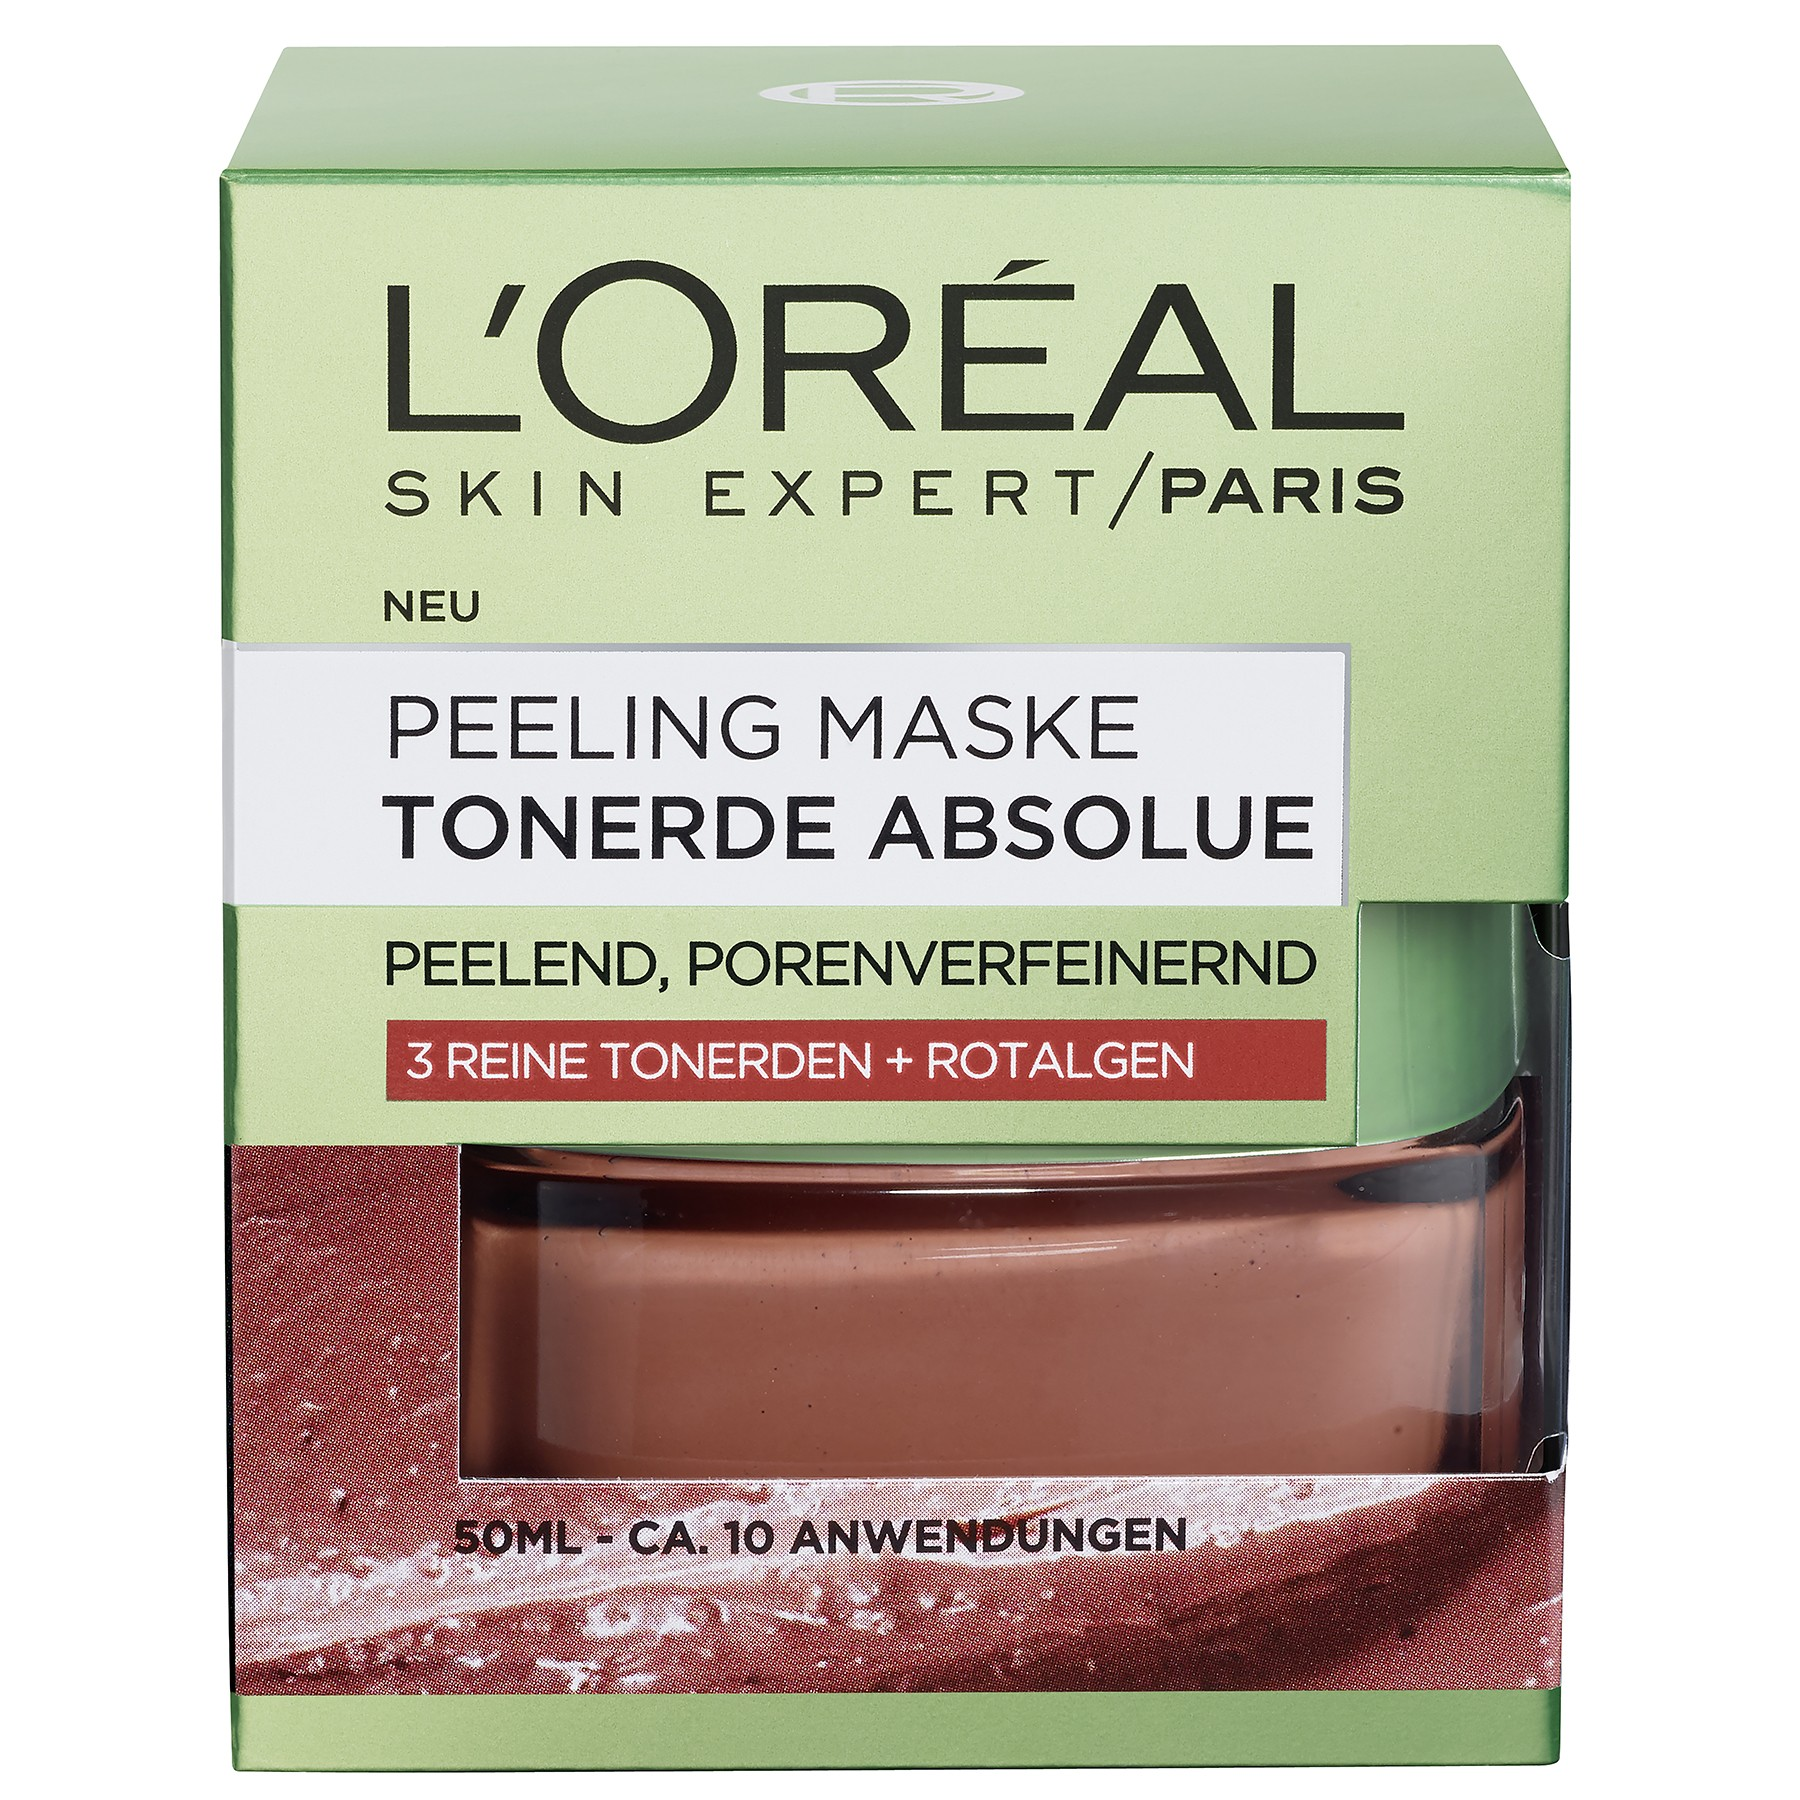 Etwas Neues genug L'Oréal Paris Gesichtsmaske - Peeling Maske Tonerde Absolue &HD_93